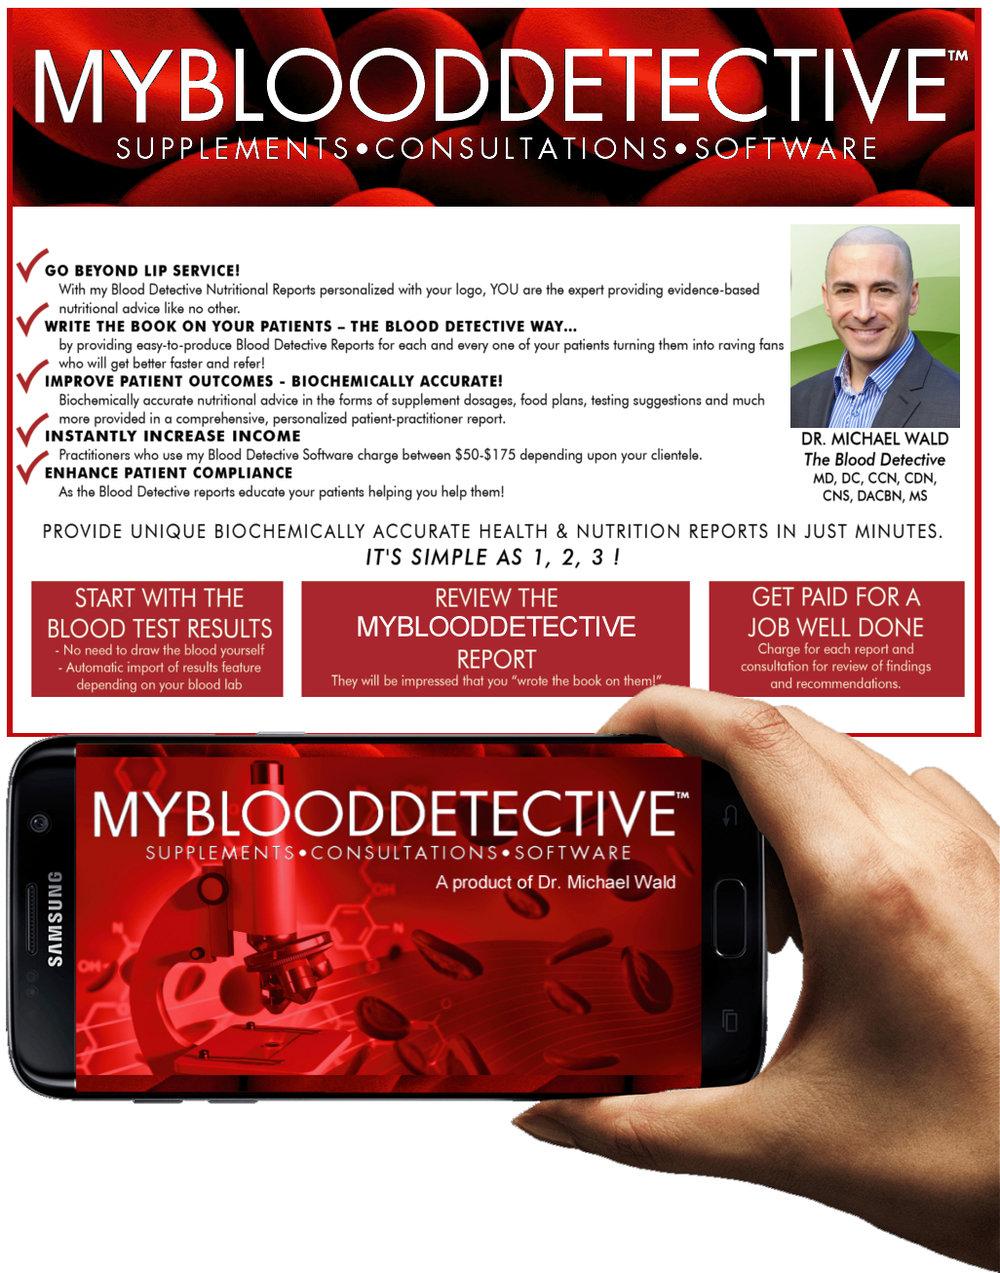 myblooddetective-ad1 copy.jpg